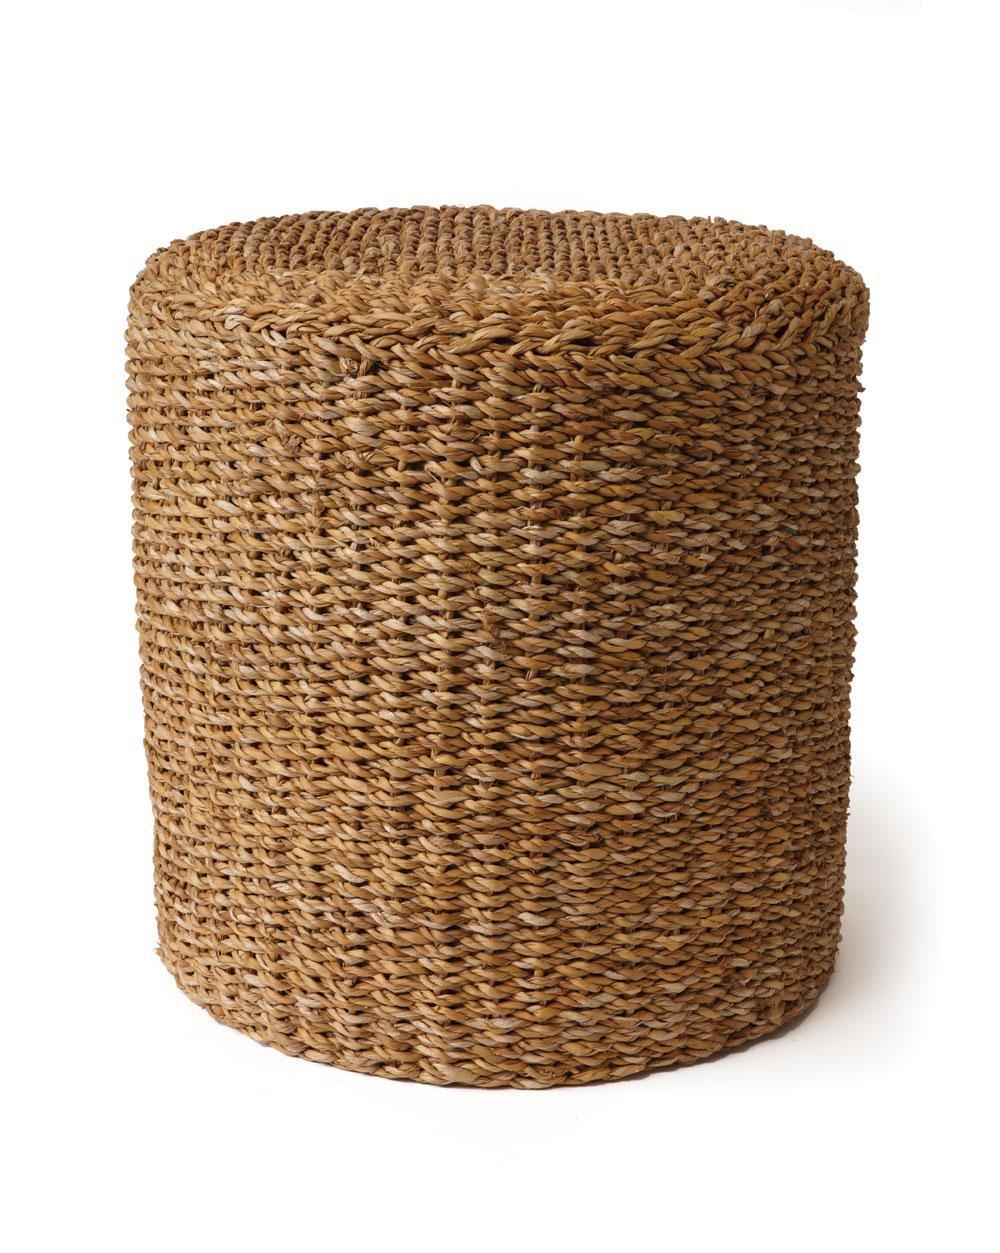 Napa Home & Garden Seagrass Round Pouf